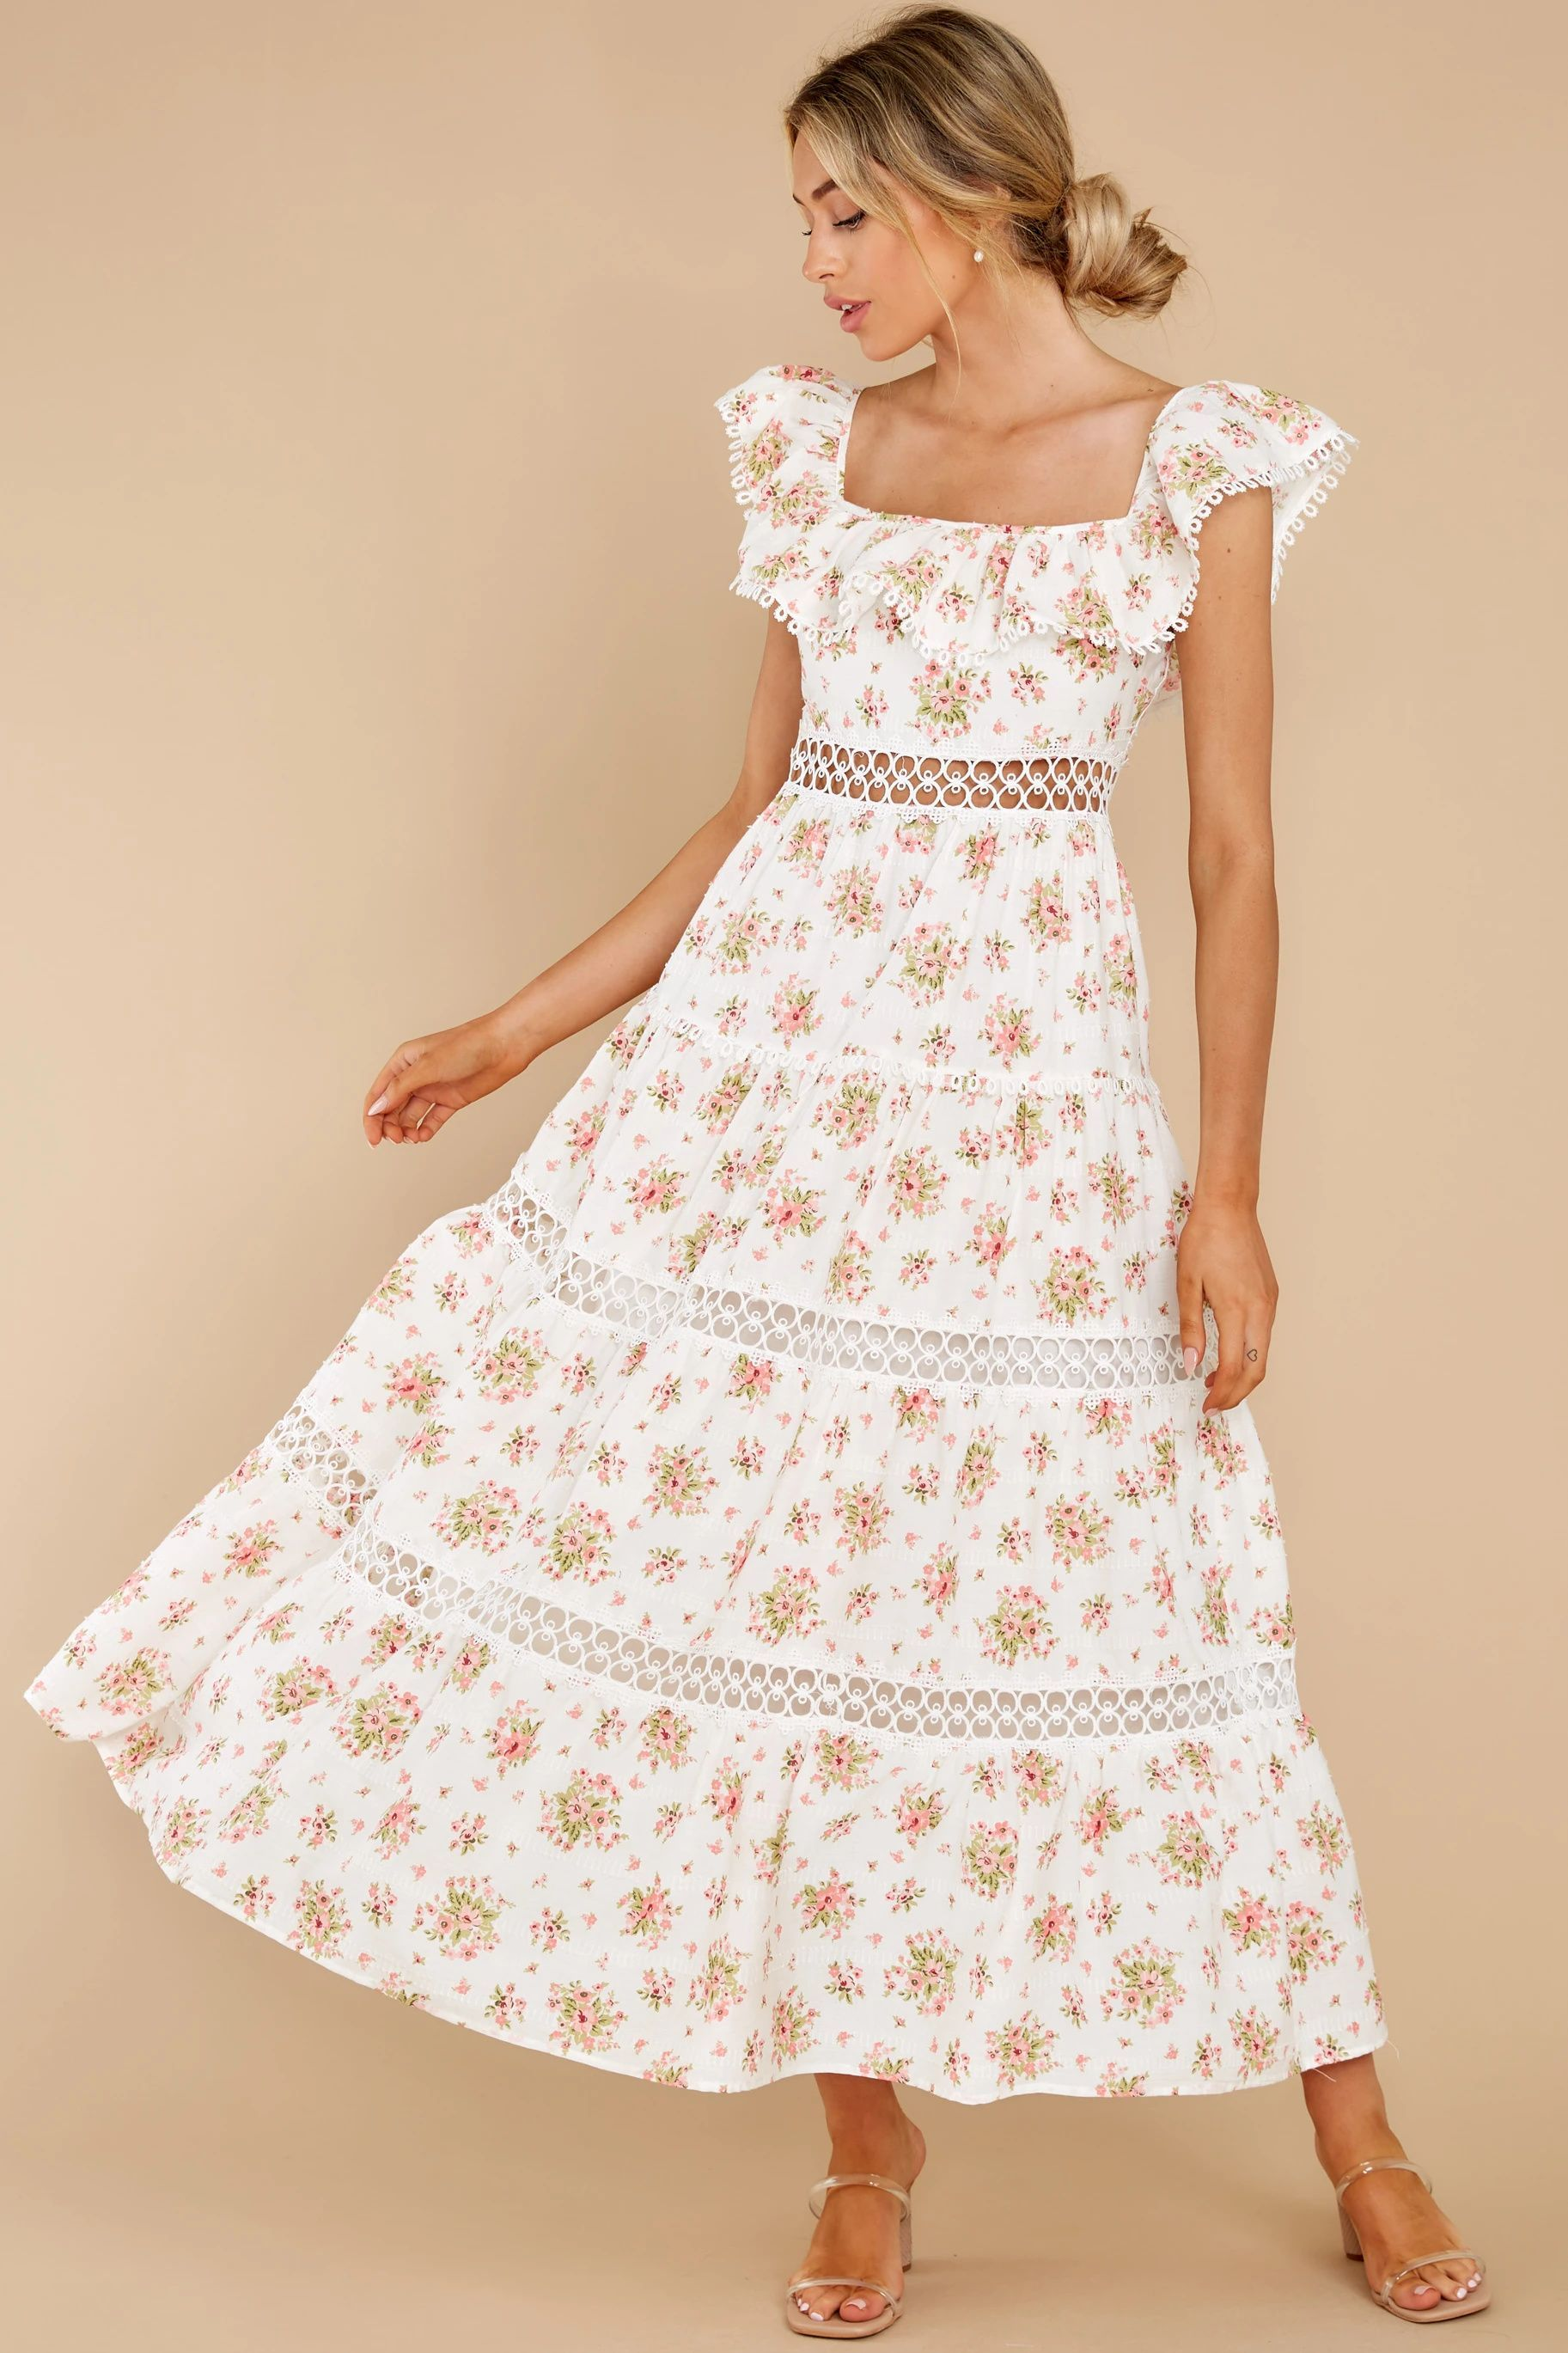 70s Dresses Summer Afternoons Maxi Hippie Dresses Disco Dress Printed Maxi Dress [ 2738 x 1825 Pixel ]